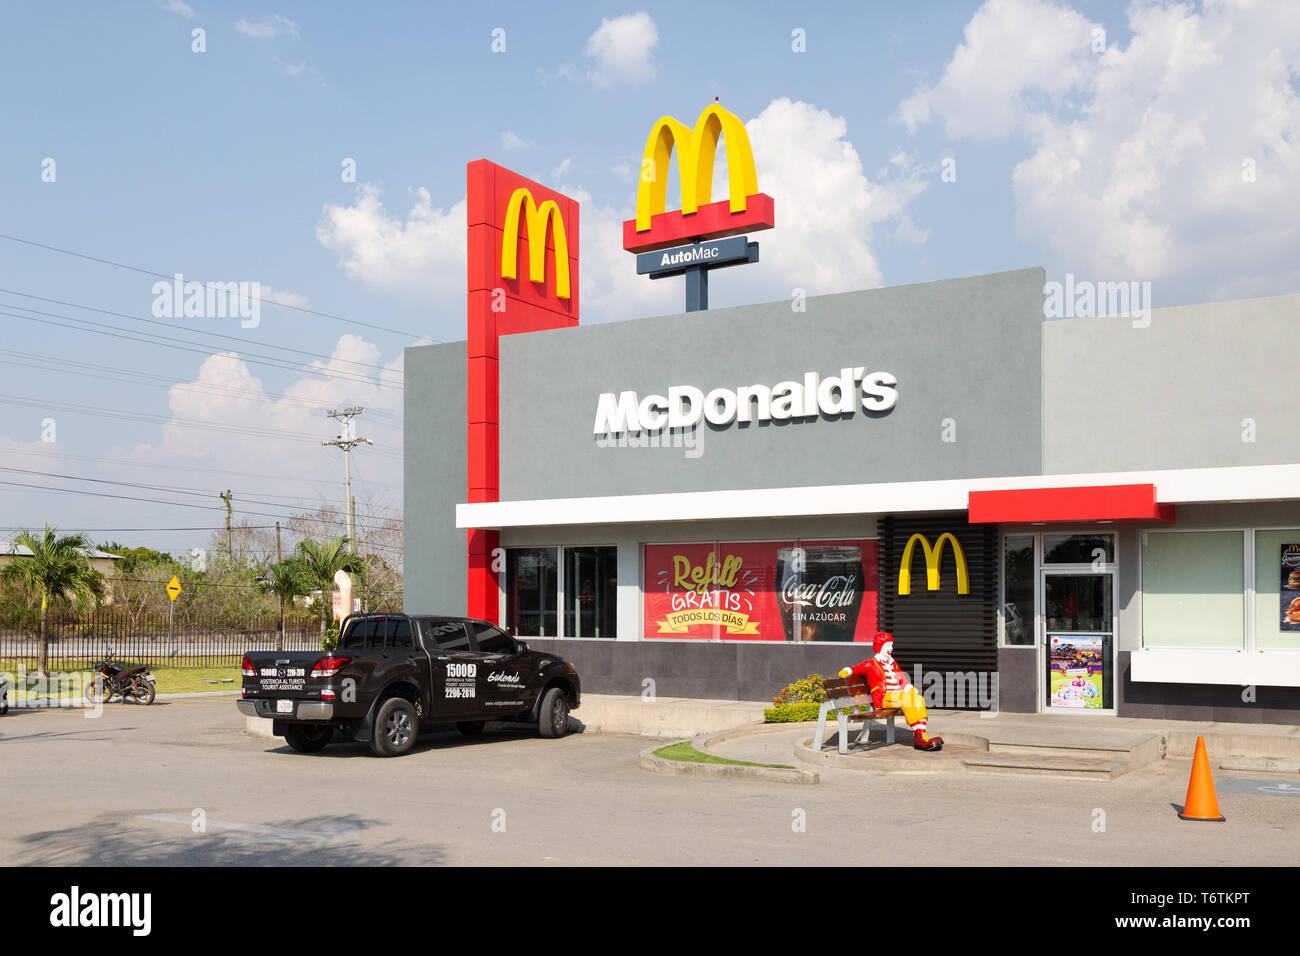 Mcdonalds Central America Mcdonalds Fast Food Restaurant Exterior Flores Town Guatemala Central America Stock Photo Alamy